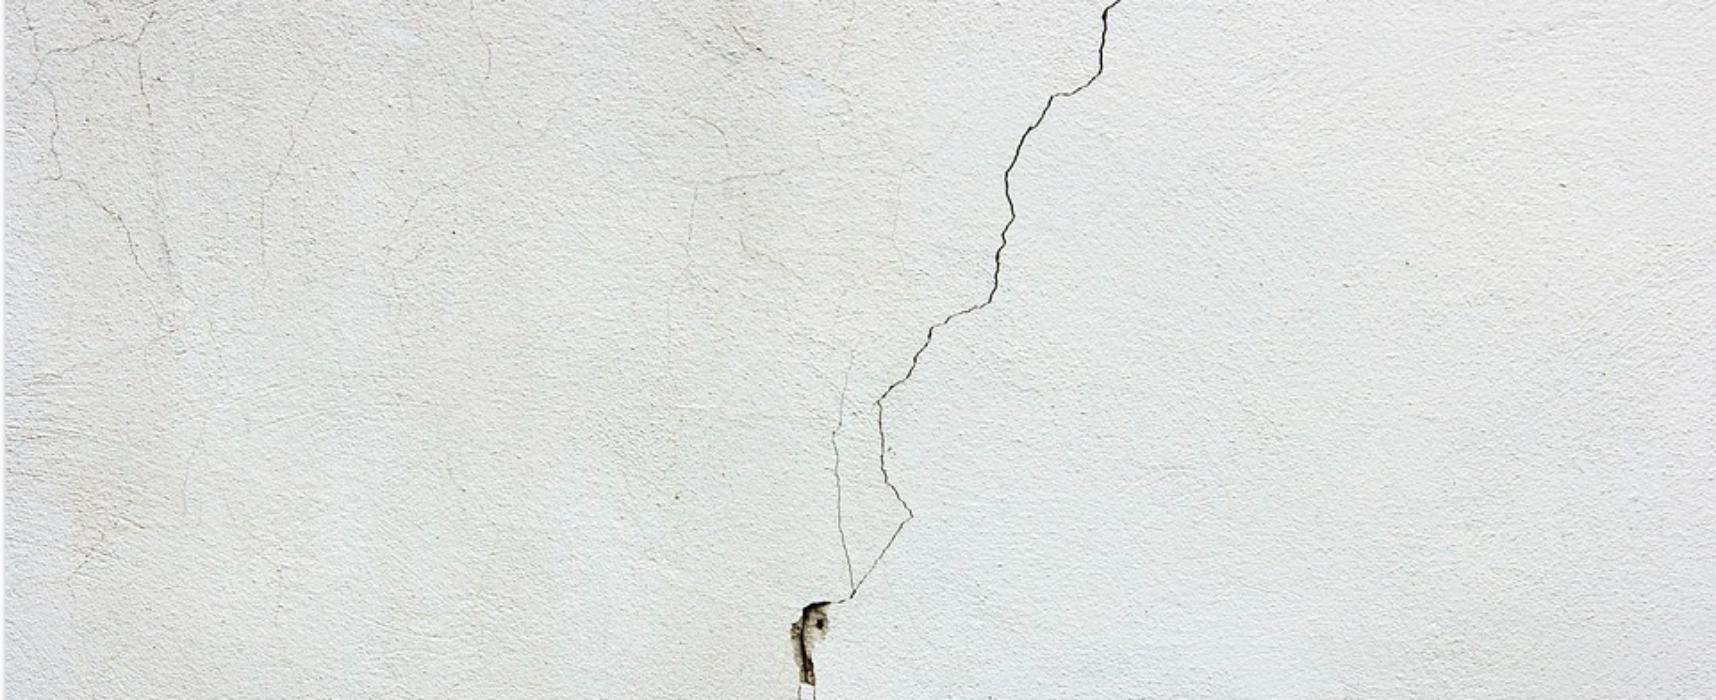 Erdbeben im Domleschg